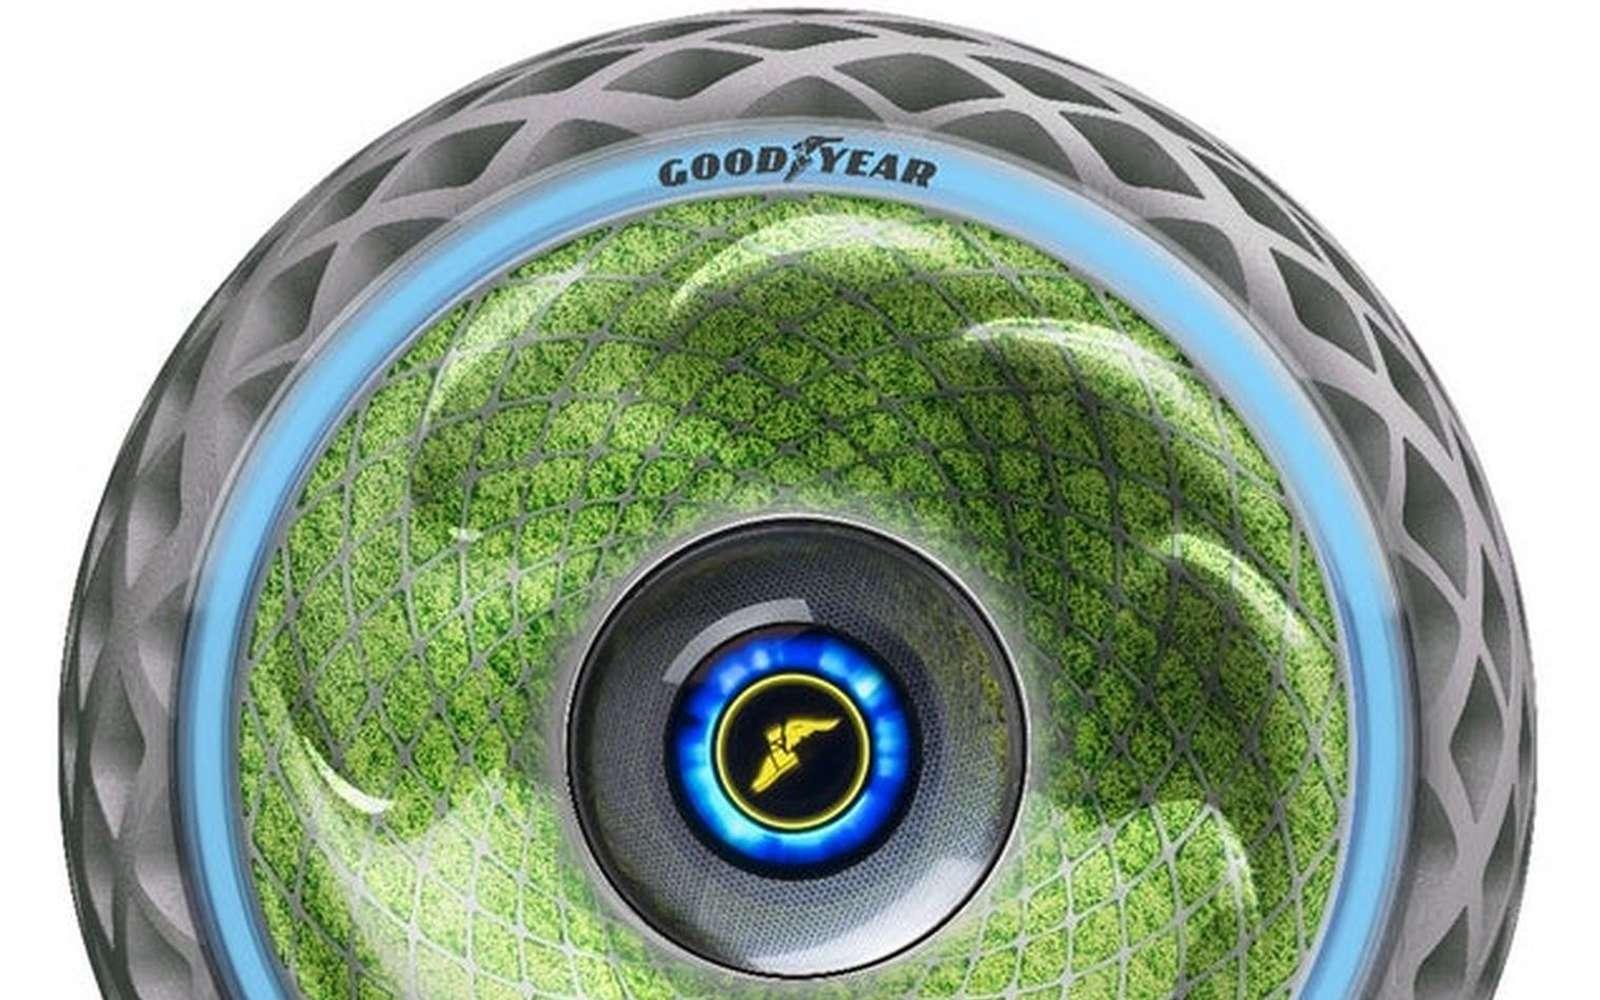 Goodyear Oxygene, le pneu qui produit de l'énergie par photosynthèse. © Goodyear